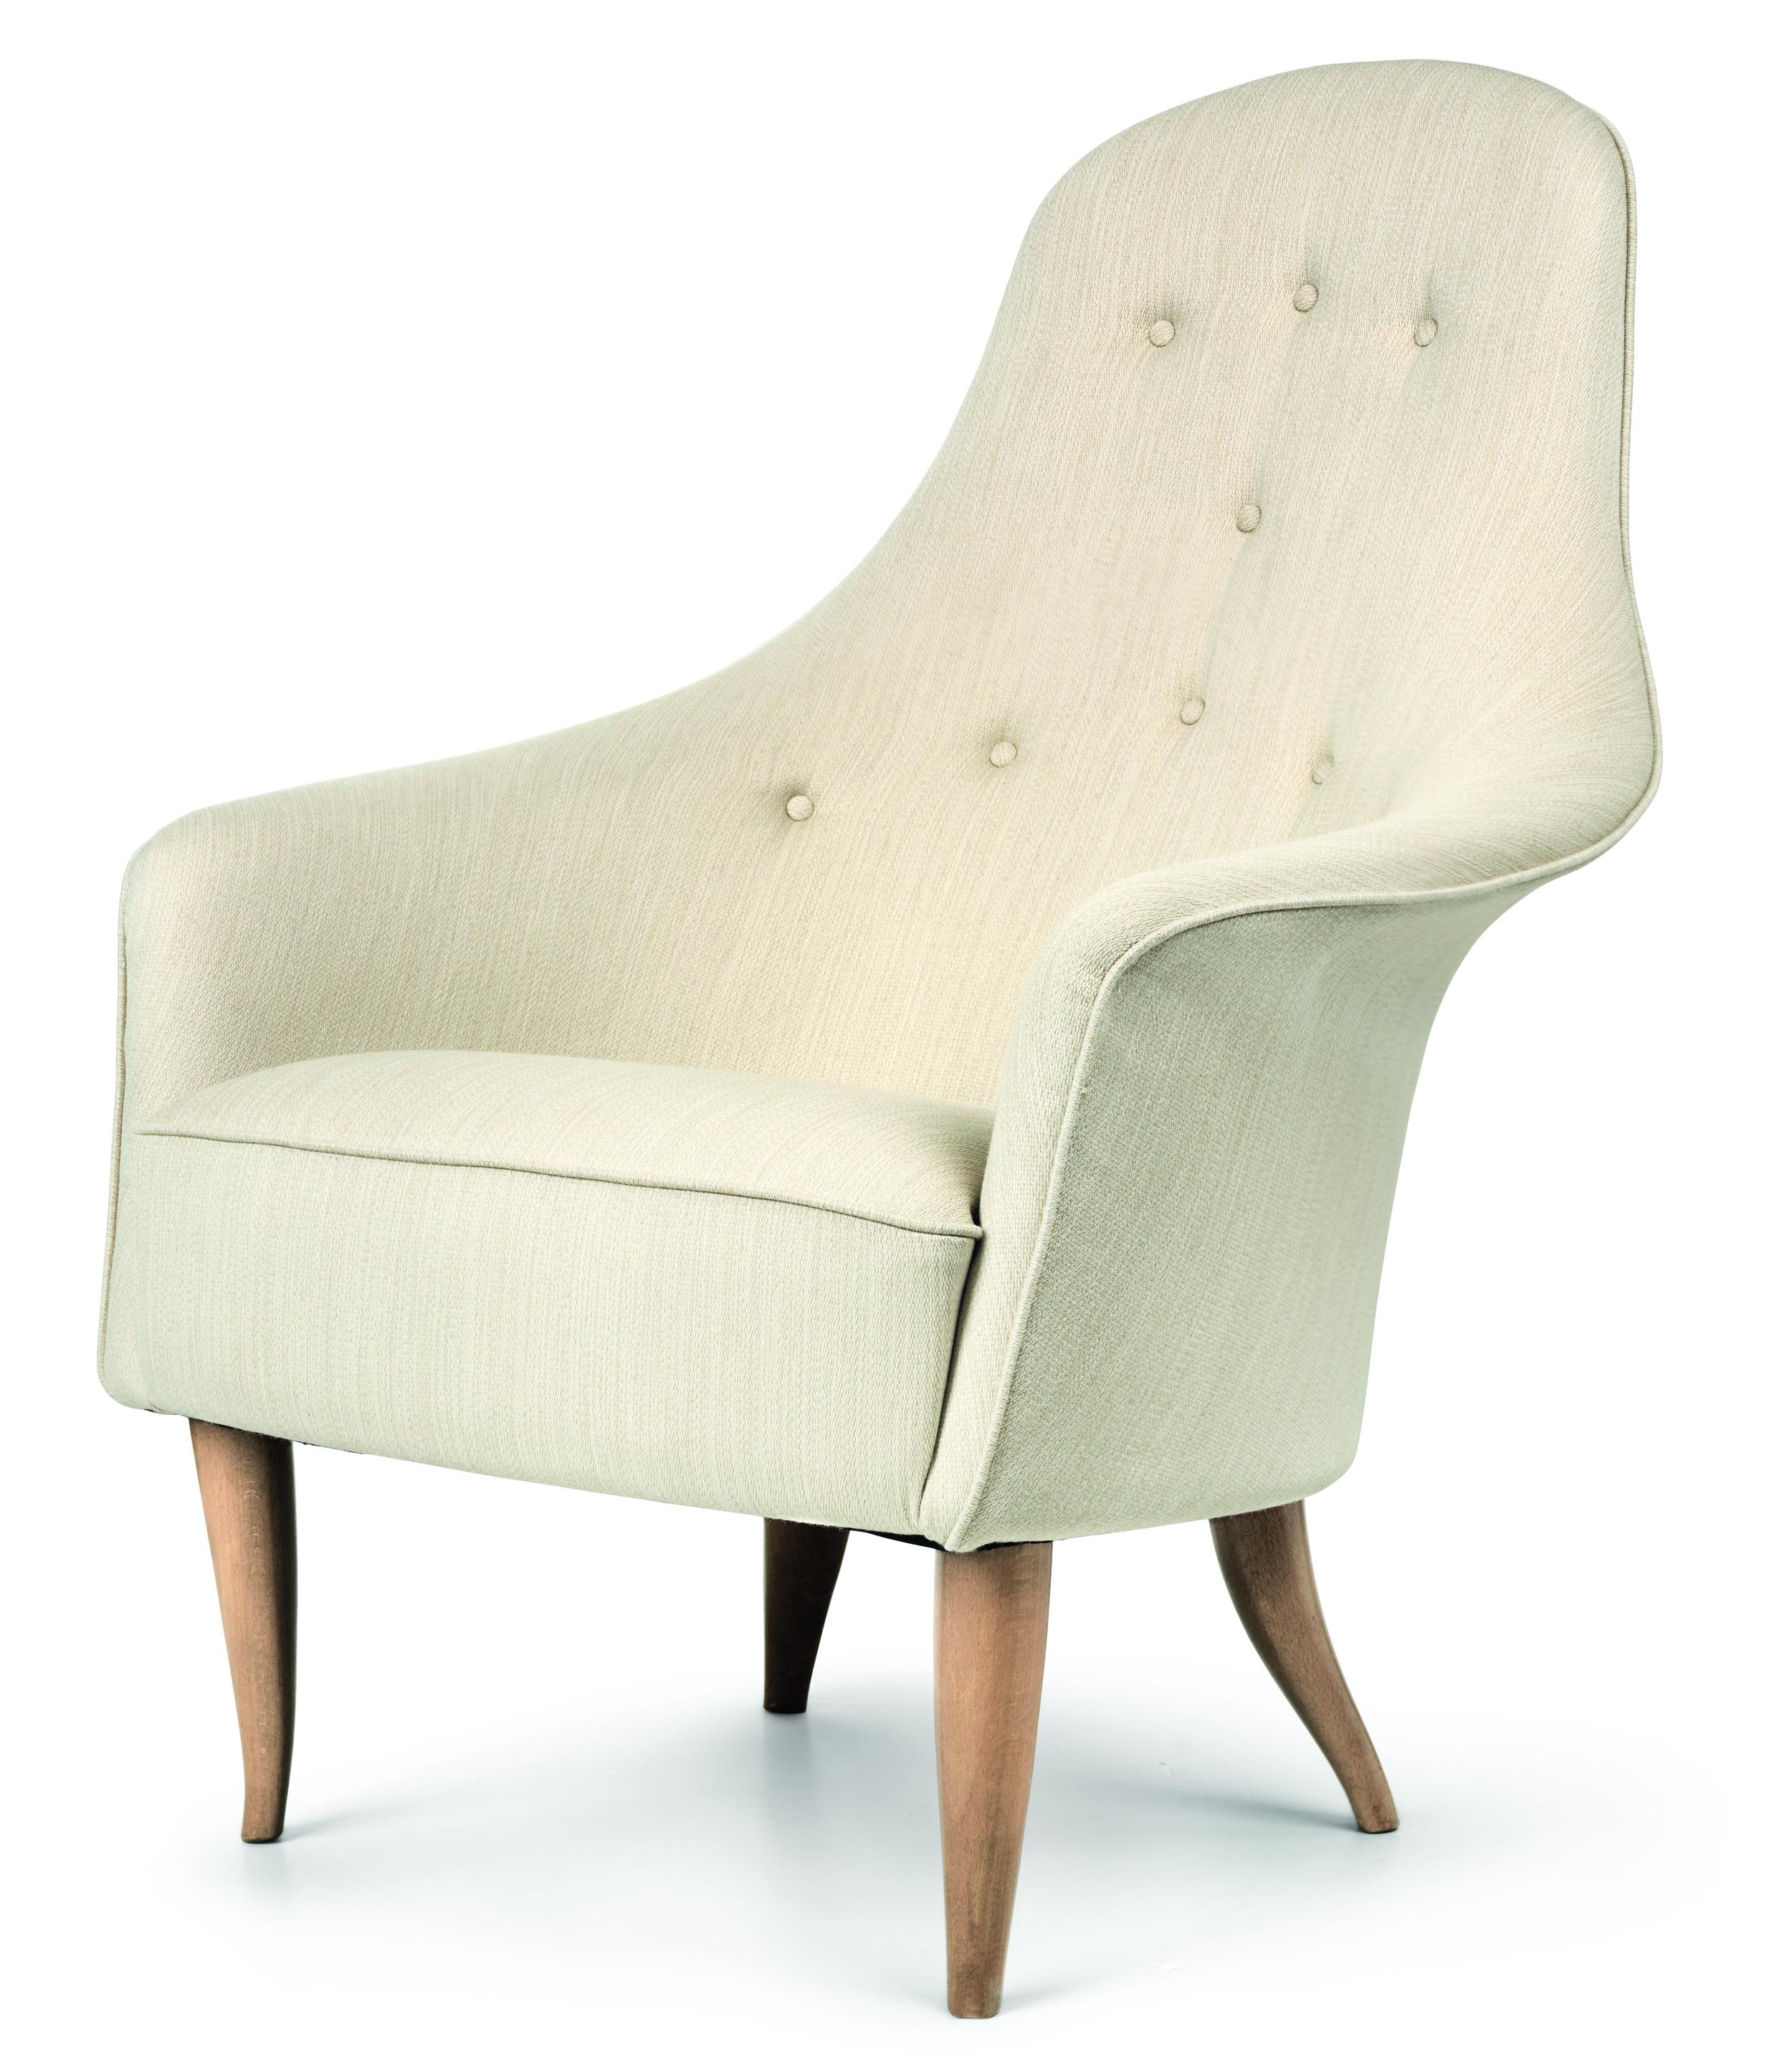 Adam Chair_Balder 2 3310_front.jpg